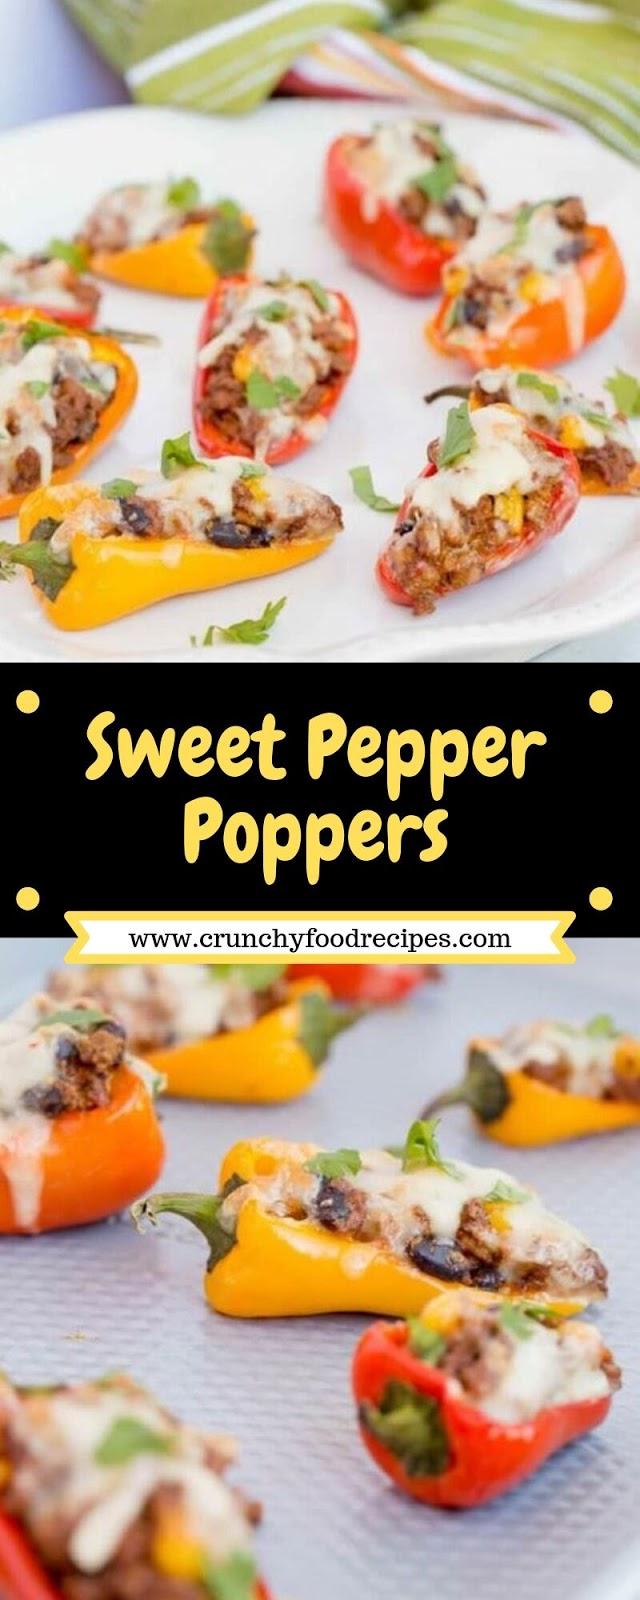 Sweet Pepper Poppers